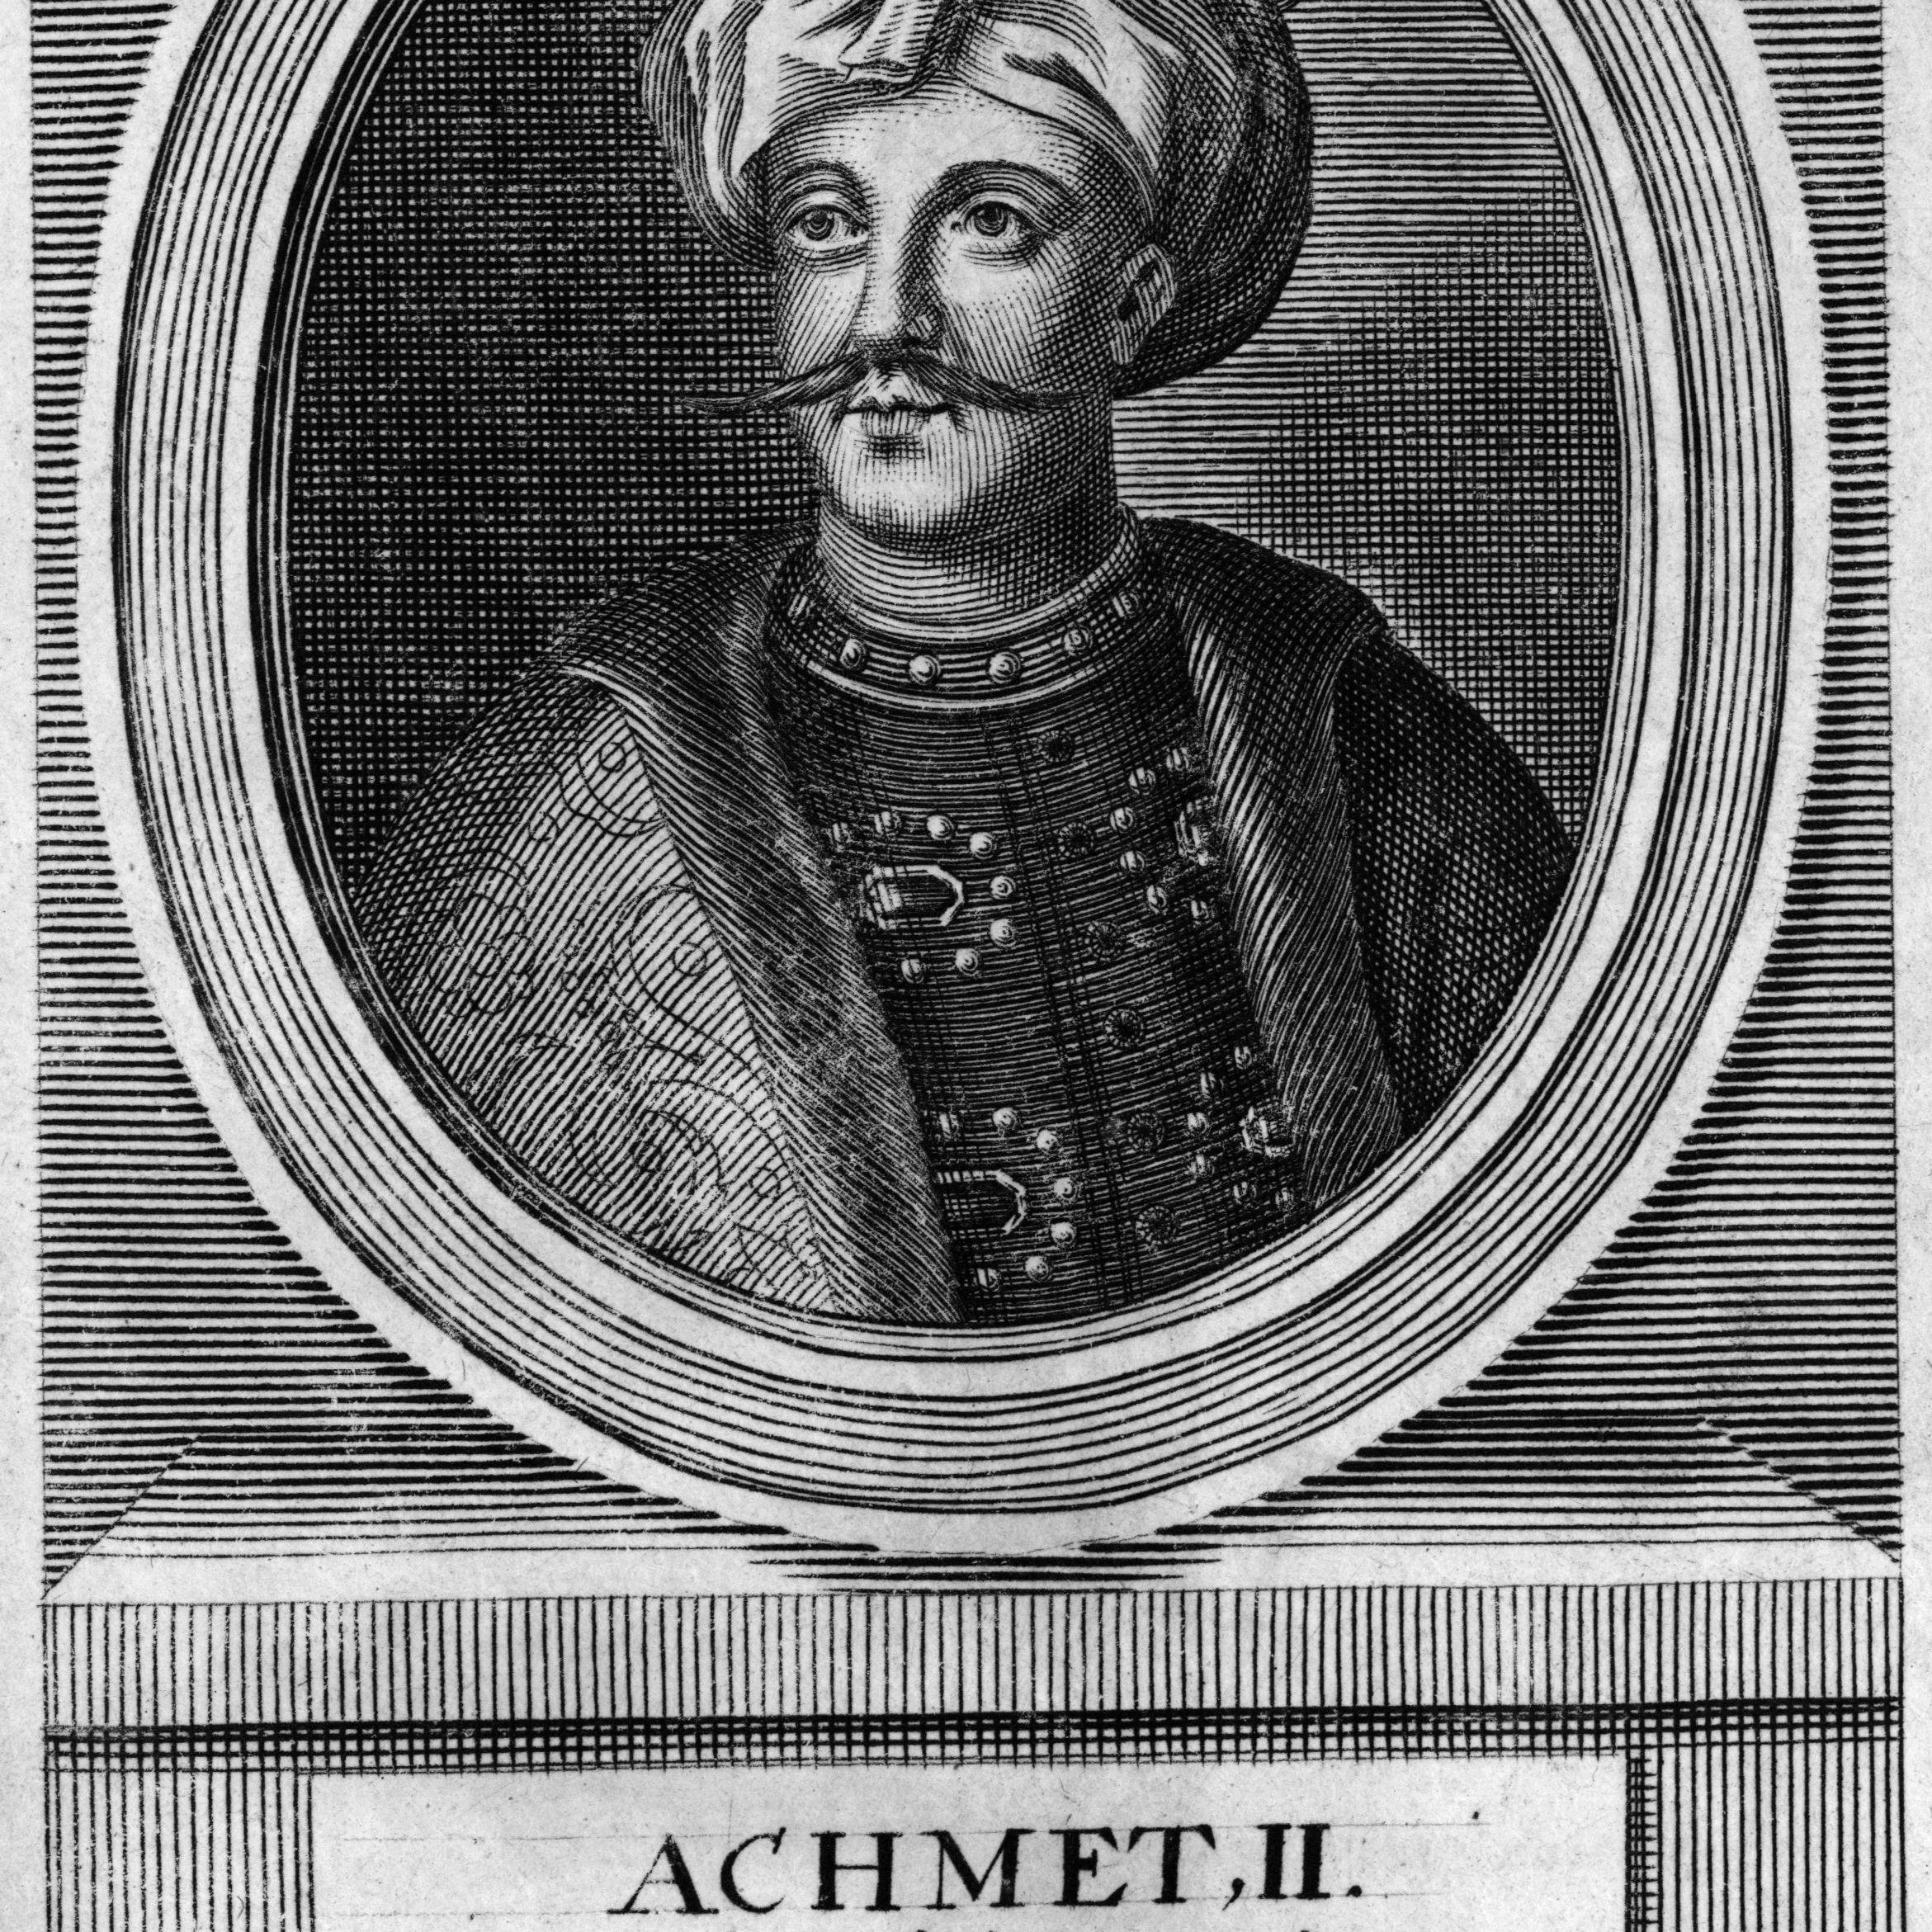 Achmet II